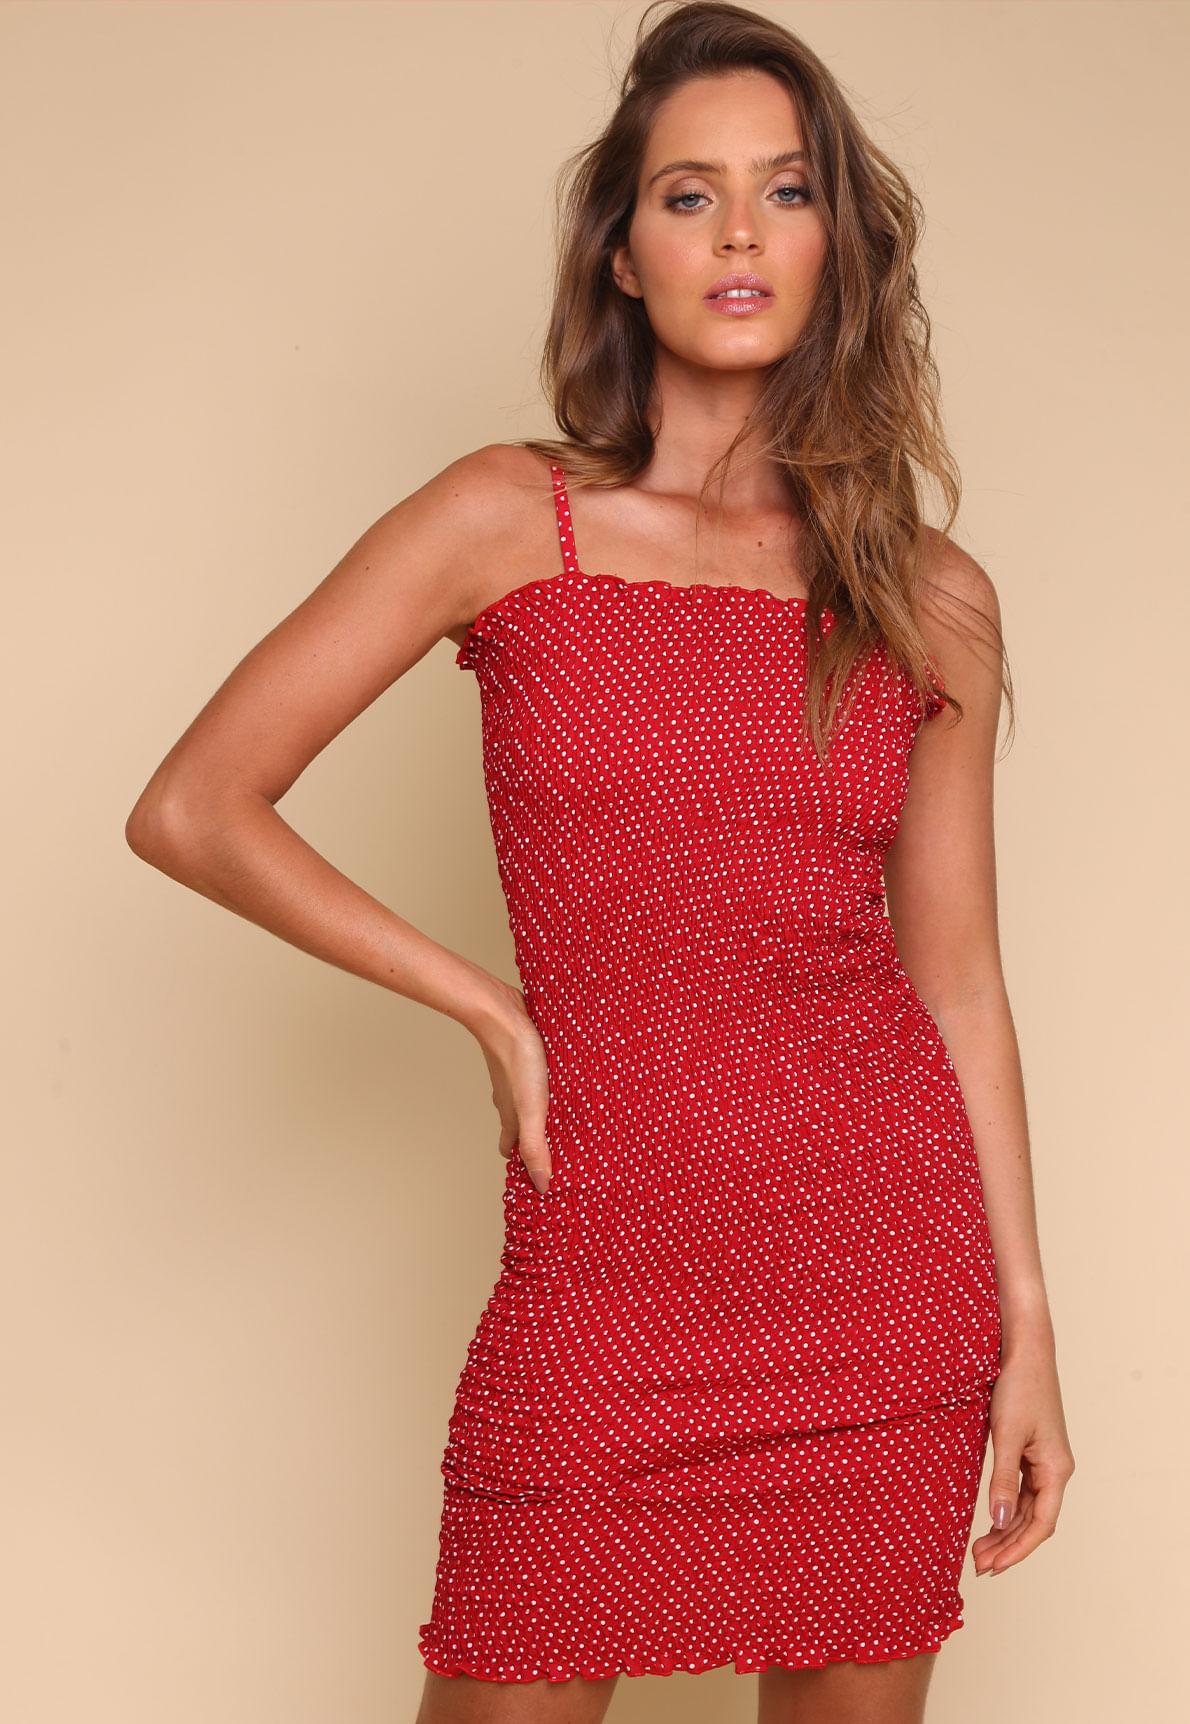 29754-vestido-lastex-poa-vermelho-bruna-mundo-lolita-08